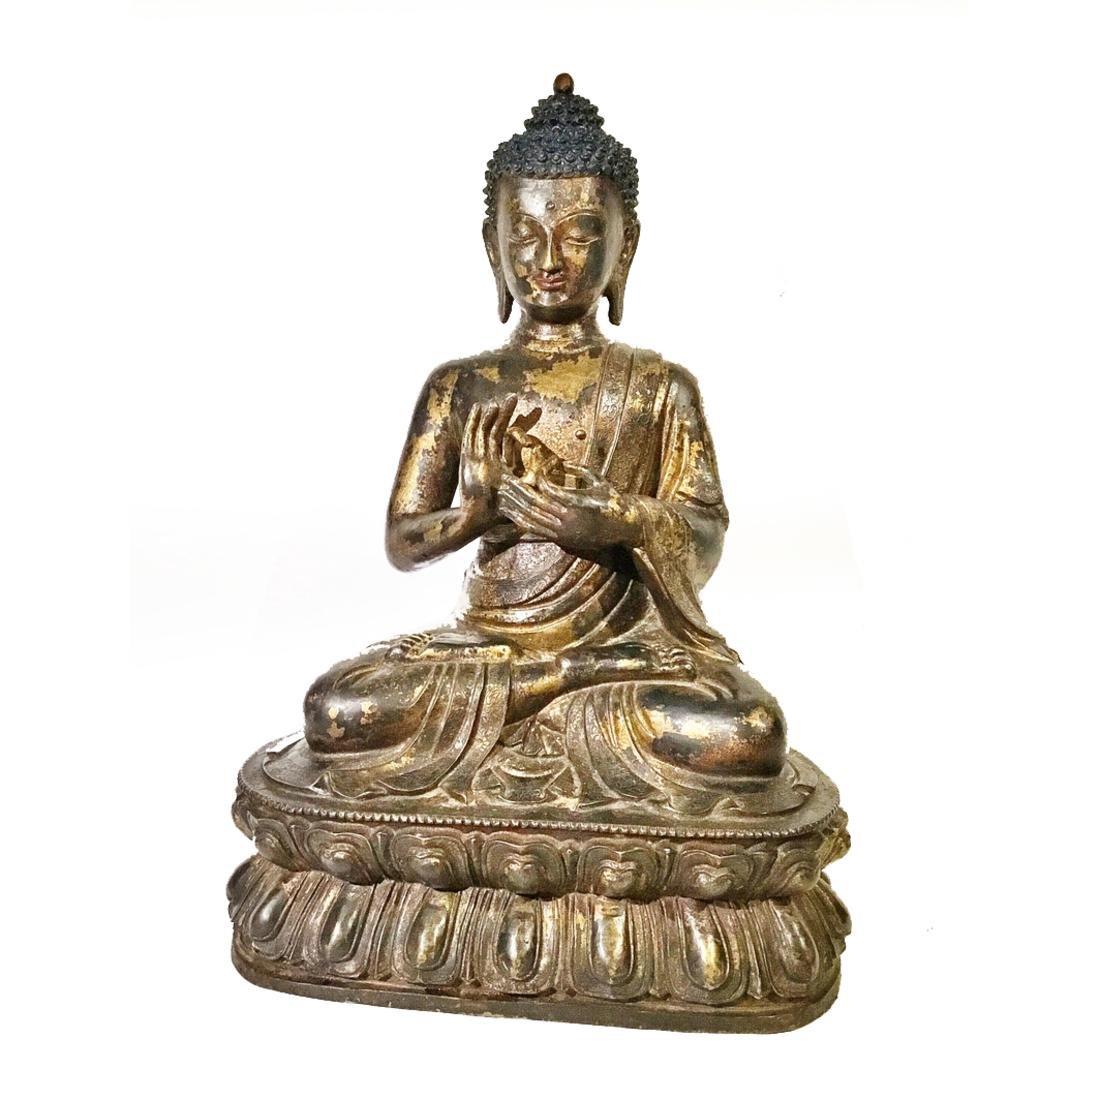 Early Chinese/Tibetan Large Gilt Bronze Buddha Statue